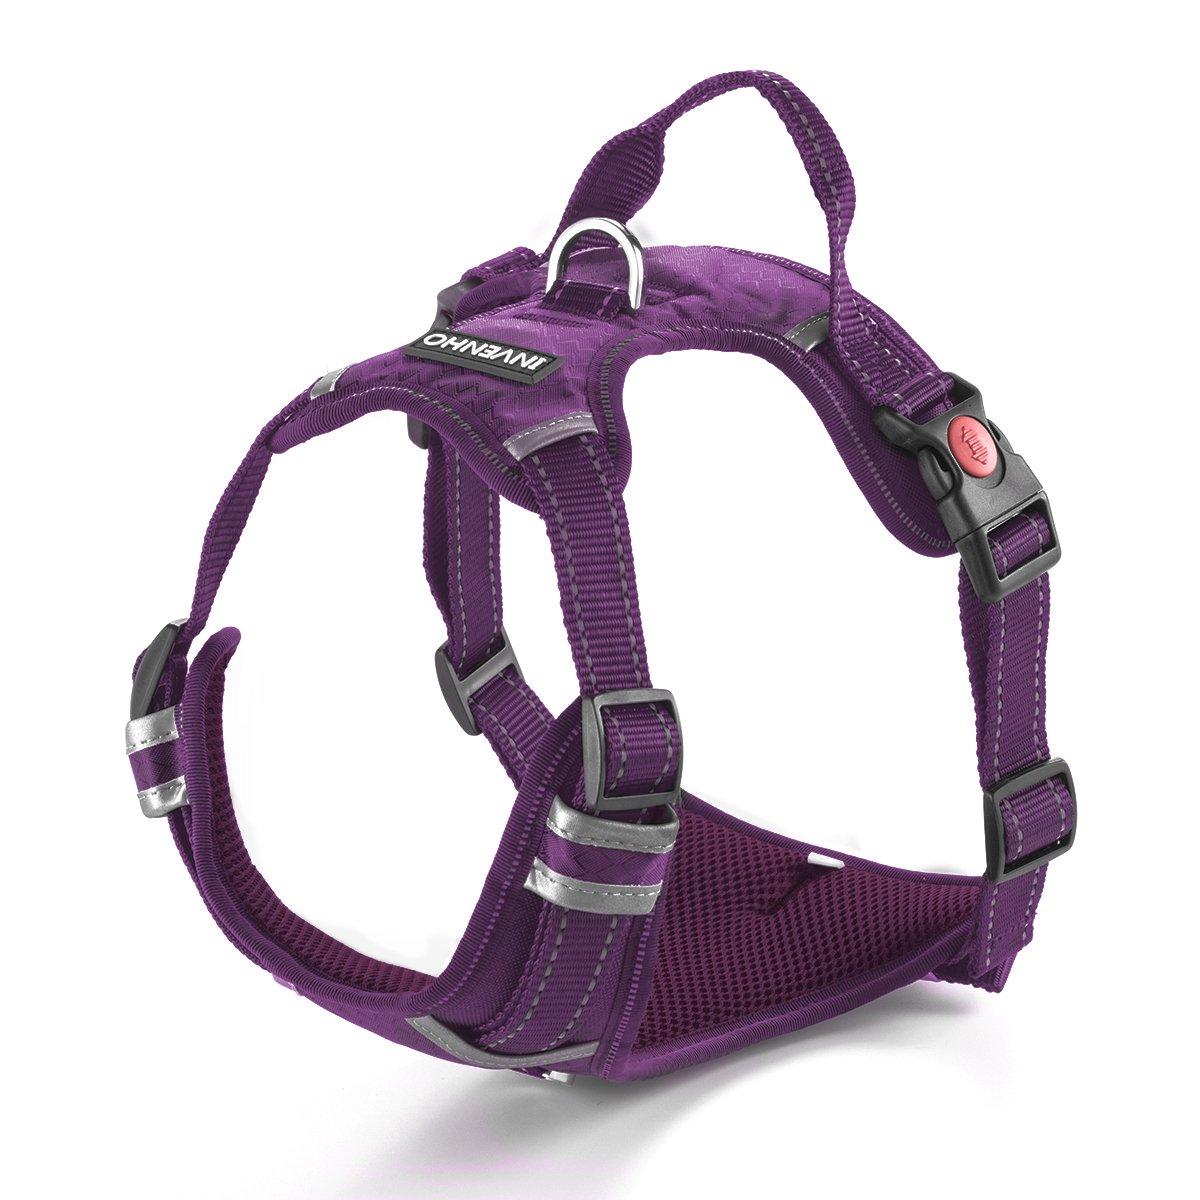 Purple DogJog Dog Harness Reflective Adjustable No Pull Pet Vest Oxford Vest for Dogs Easy Control for Medium Large Dogs (Purple)